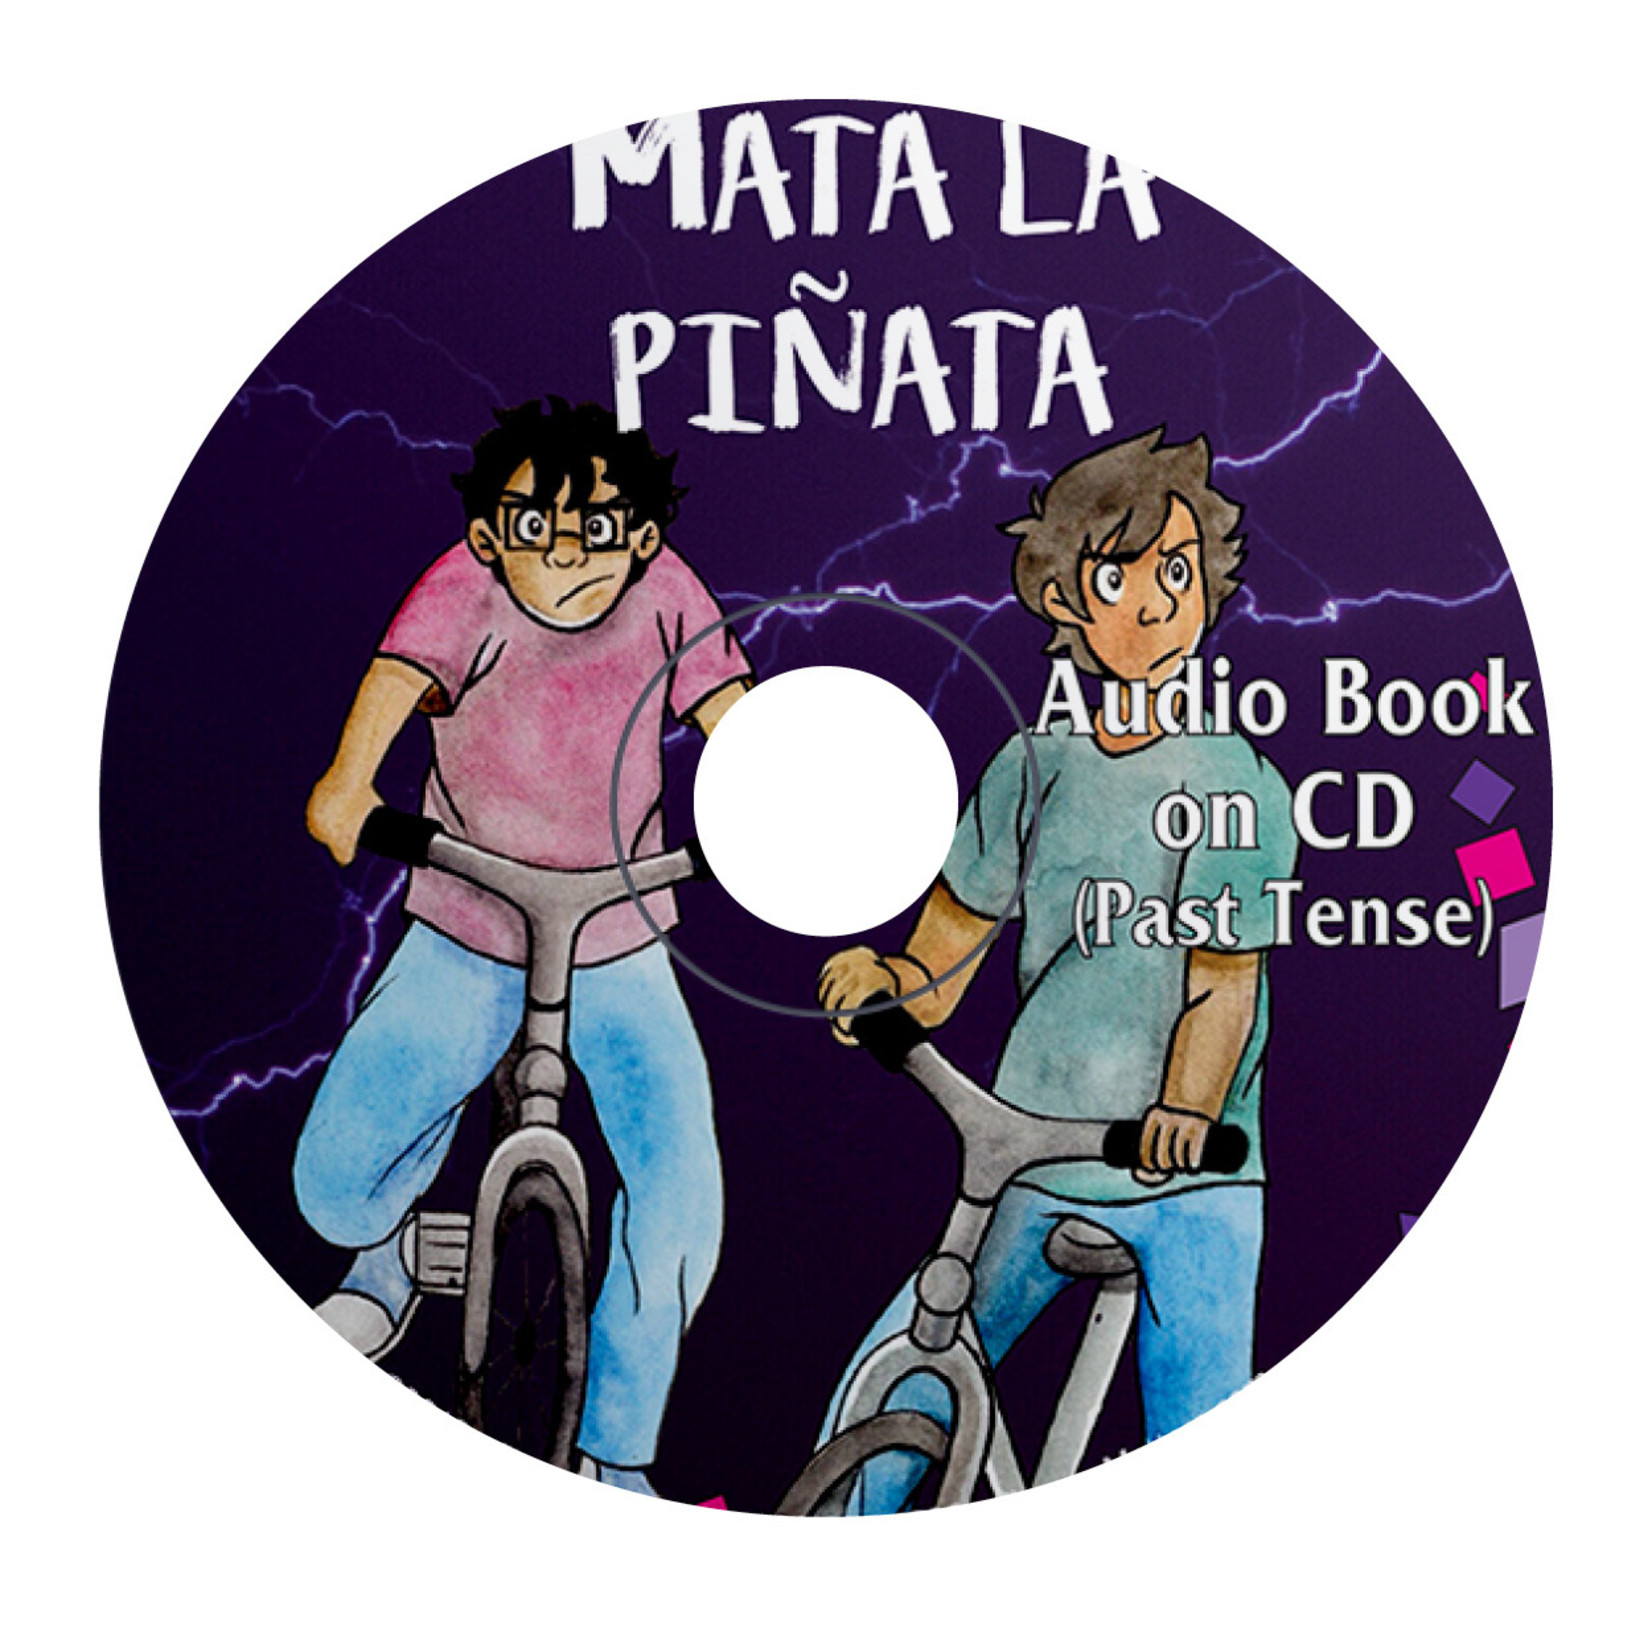 Fluency Matters Mata la piñata - Luisterboek